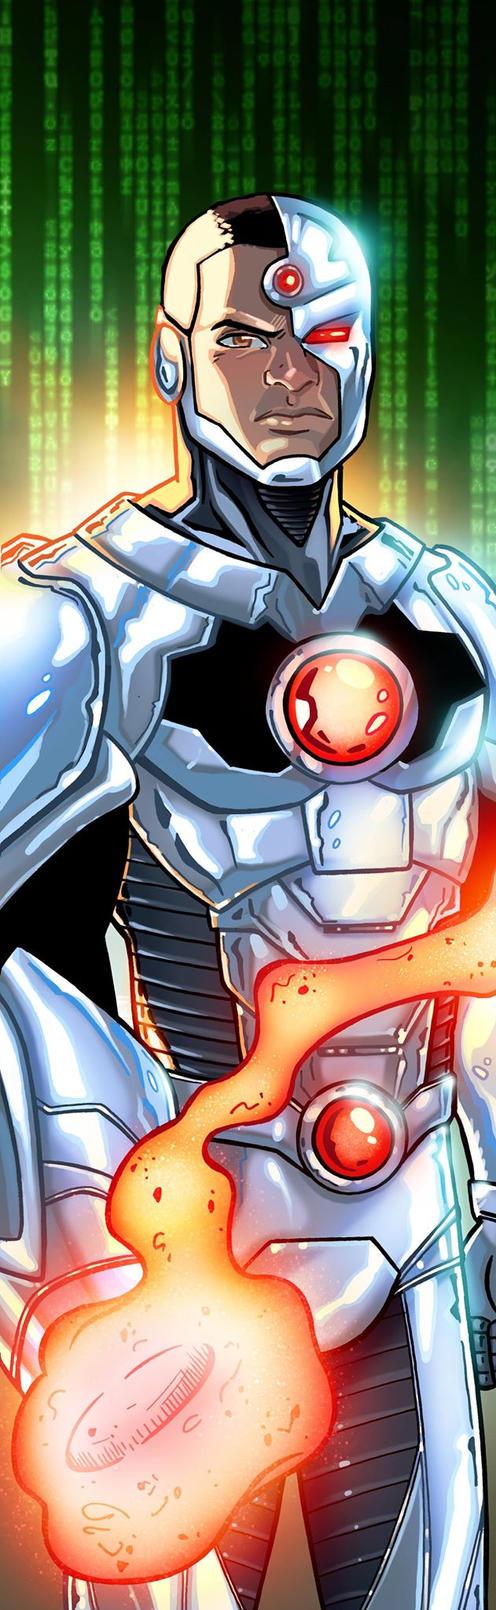 Cyborg Panel Art by RichBernatovech